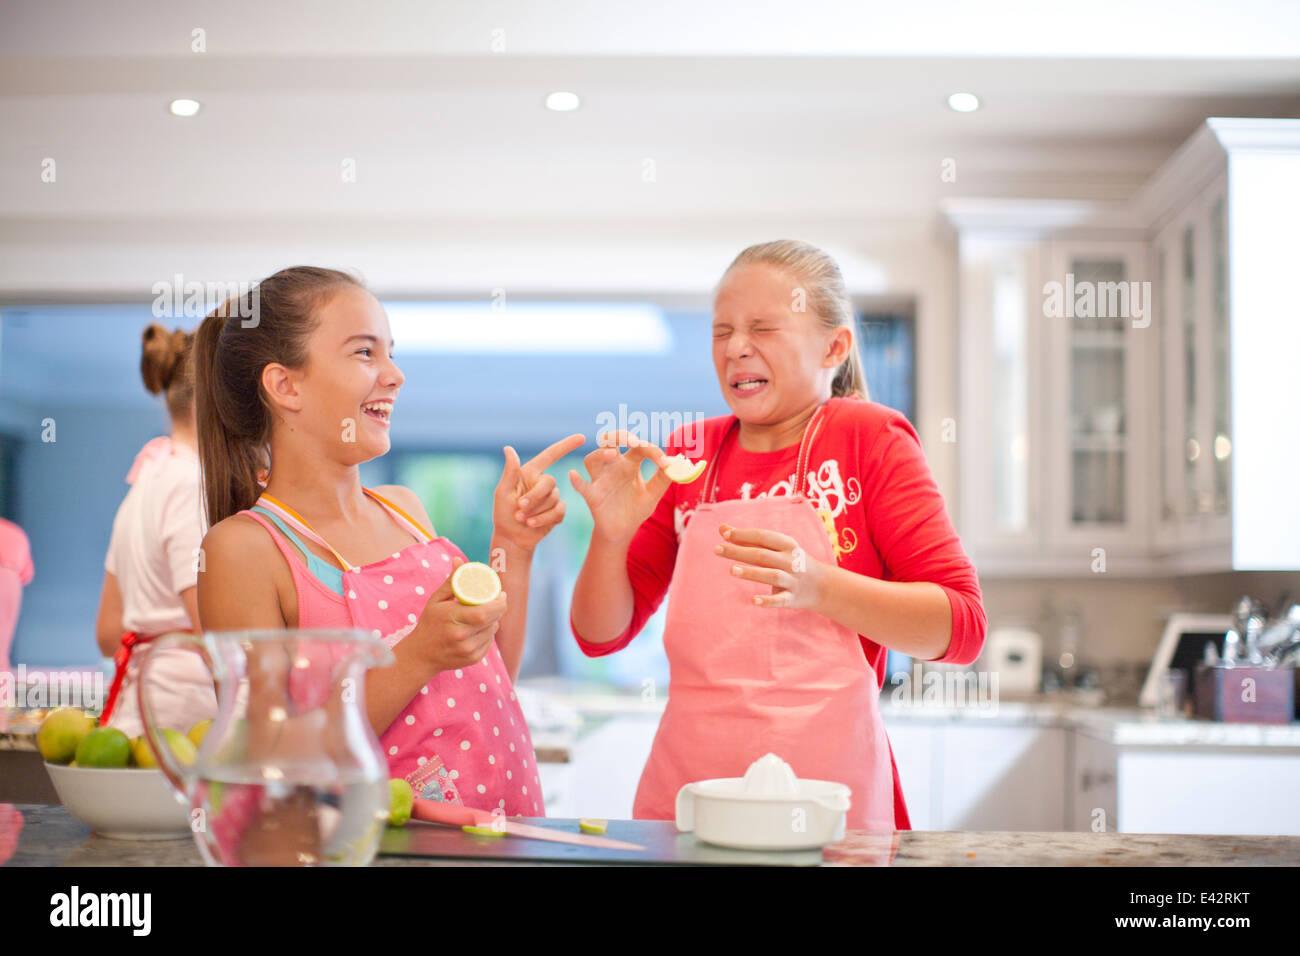 Two teenage girls tasting sour lemons in kitchen - Stock Image